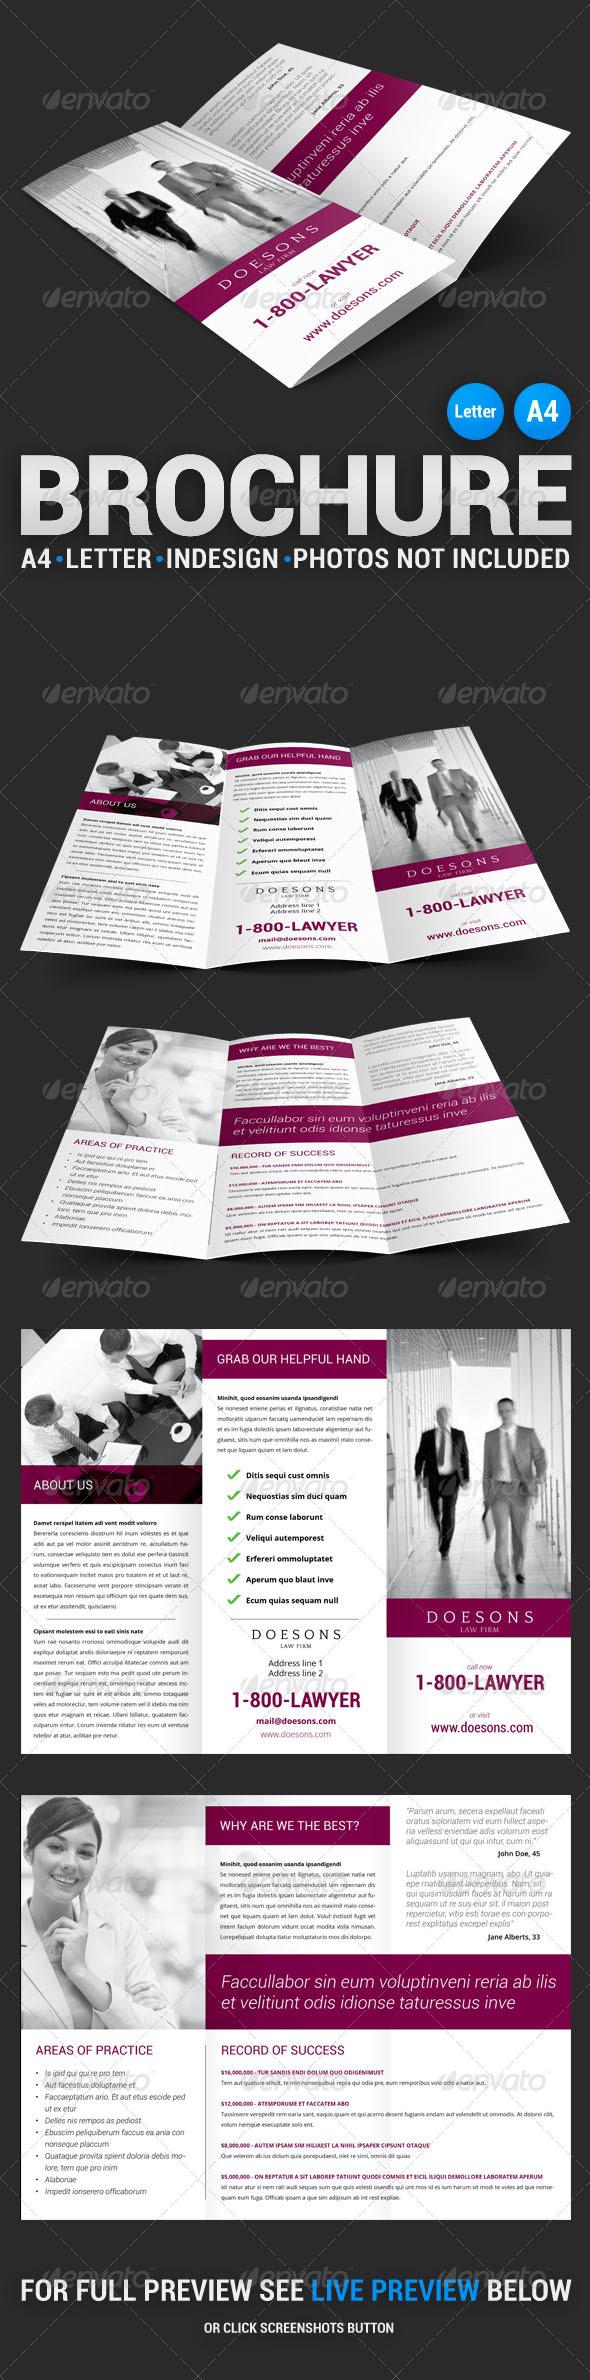 Law Firm Tri Fold Brochure Trifold Brochure Brochure Trifold Brochure Design